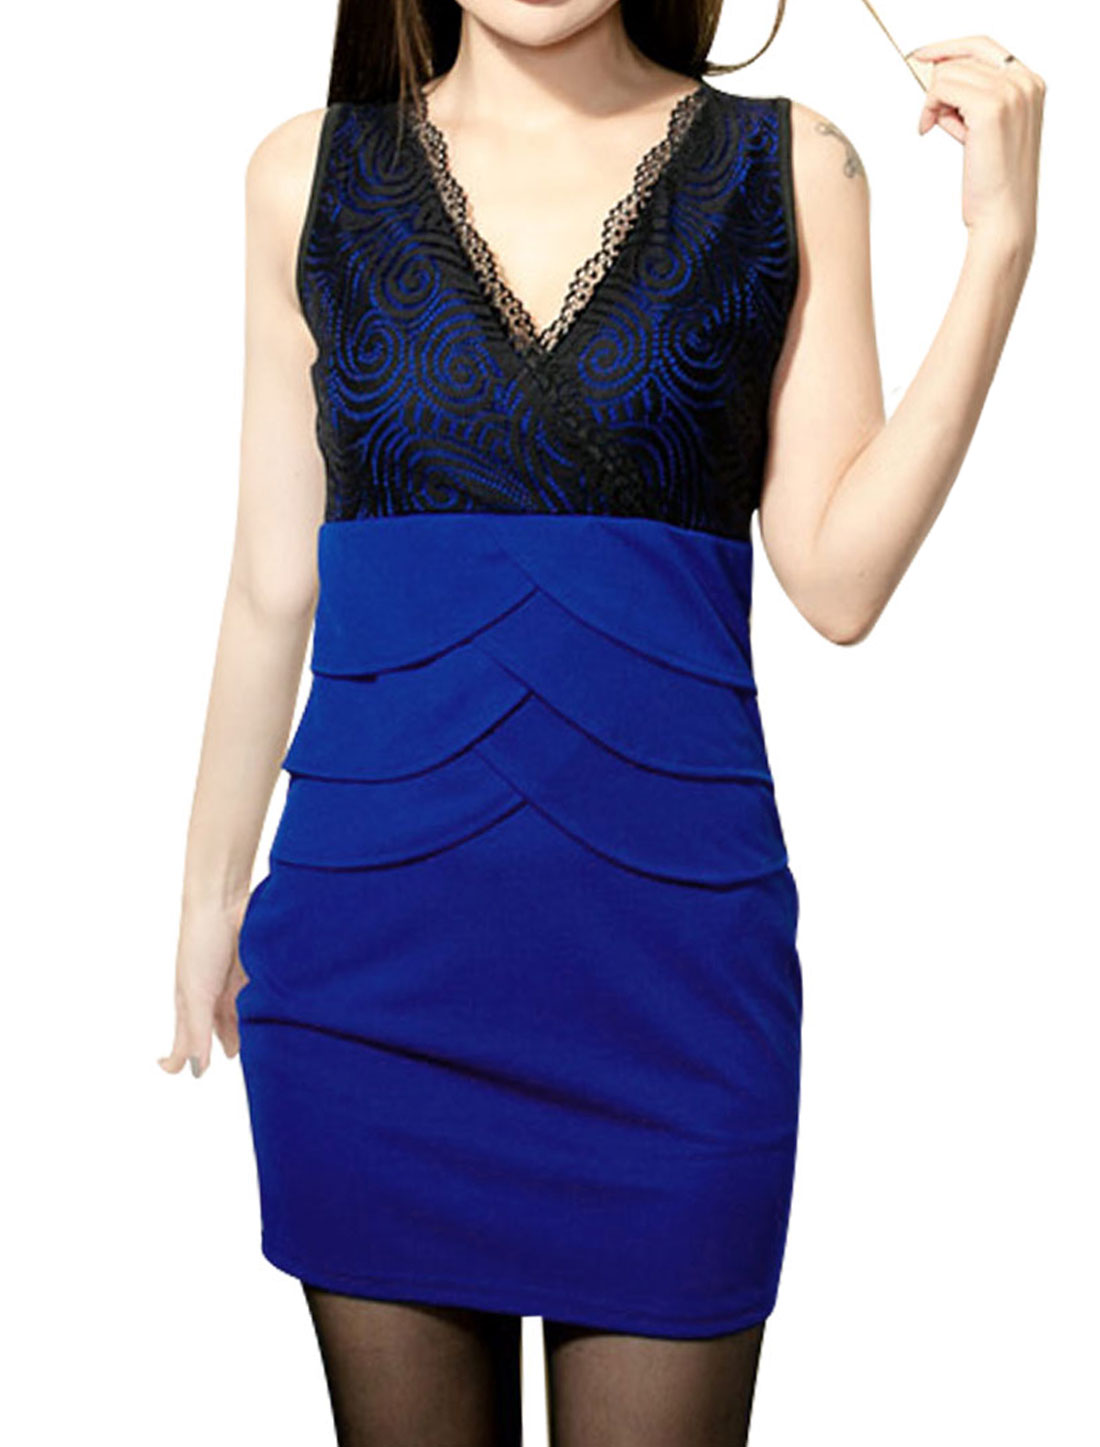 Ladies Sleeveless Royal Blue Black Cross Front Design Mini Dress XS